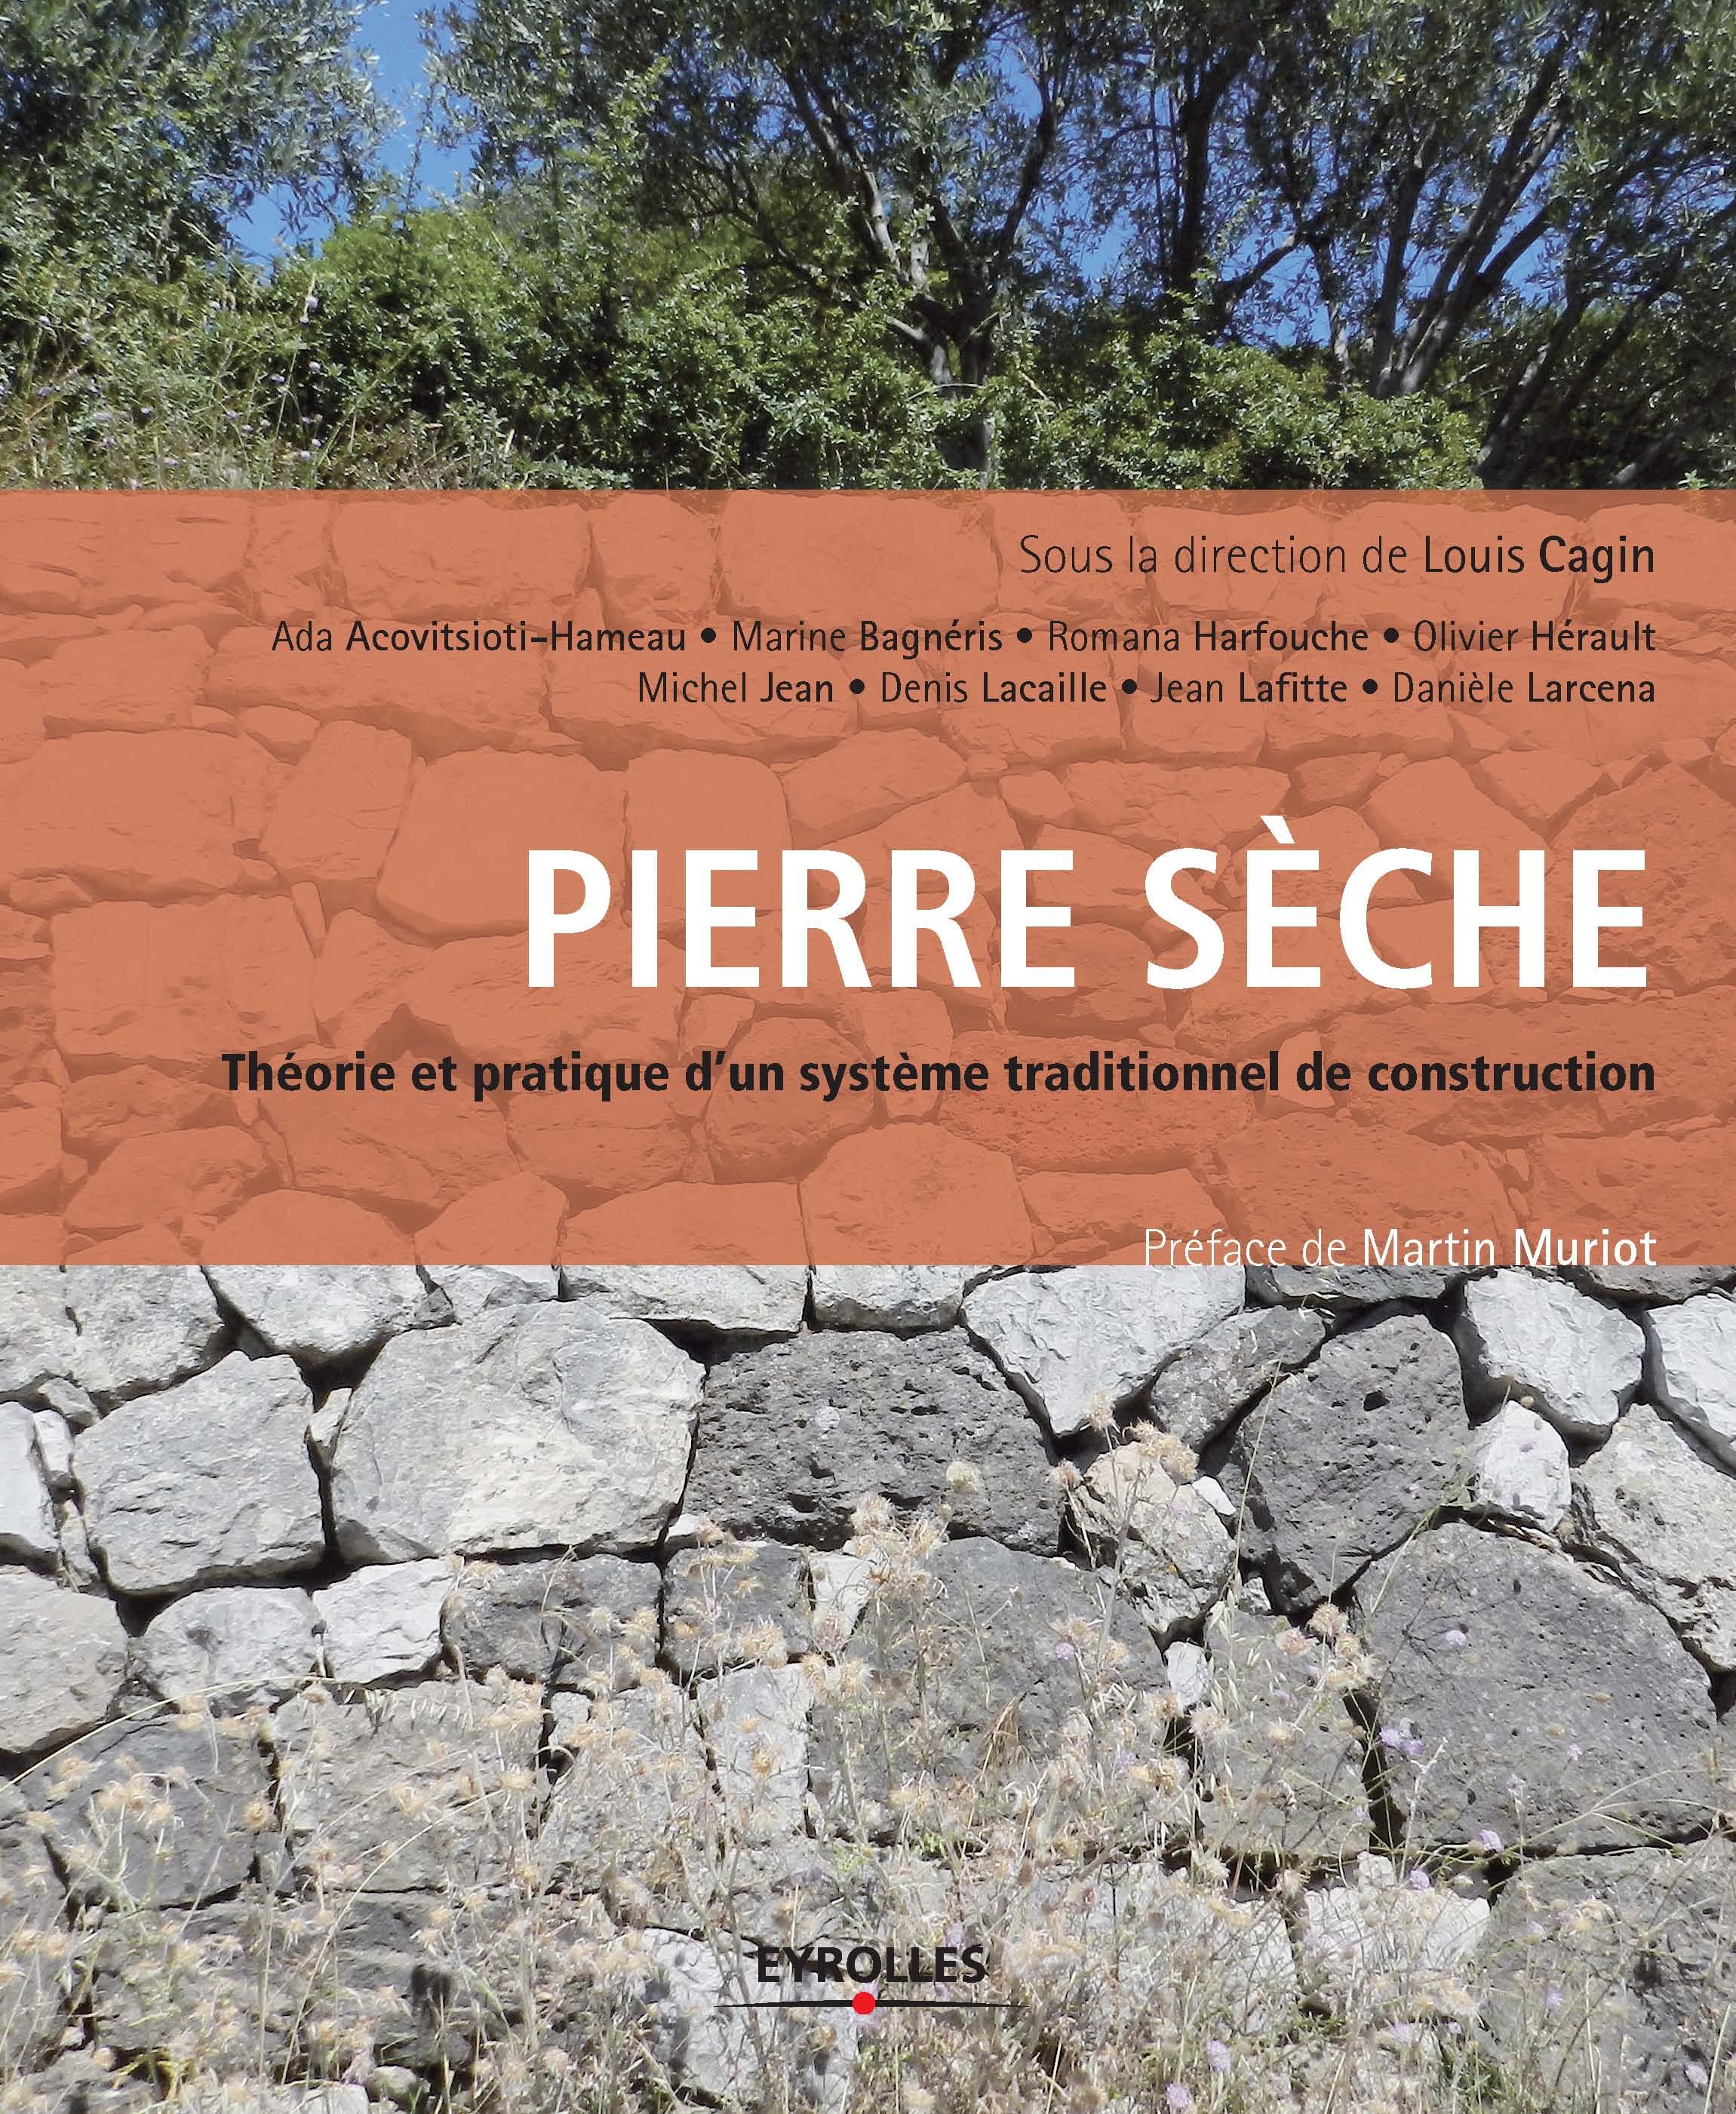 G673517_Pierre_sèche_c1